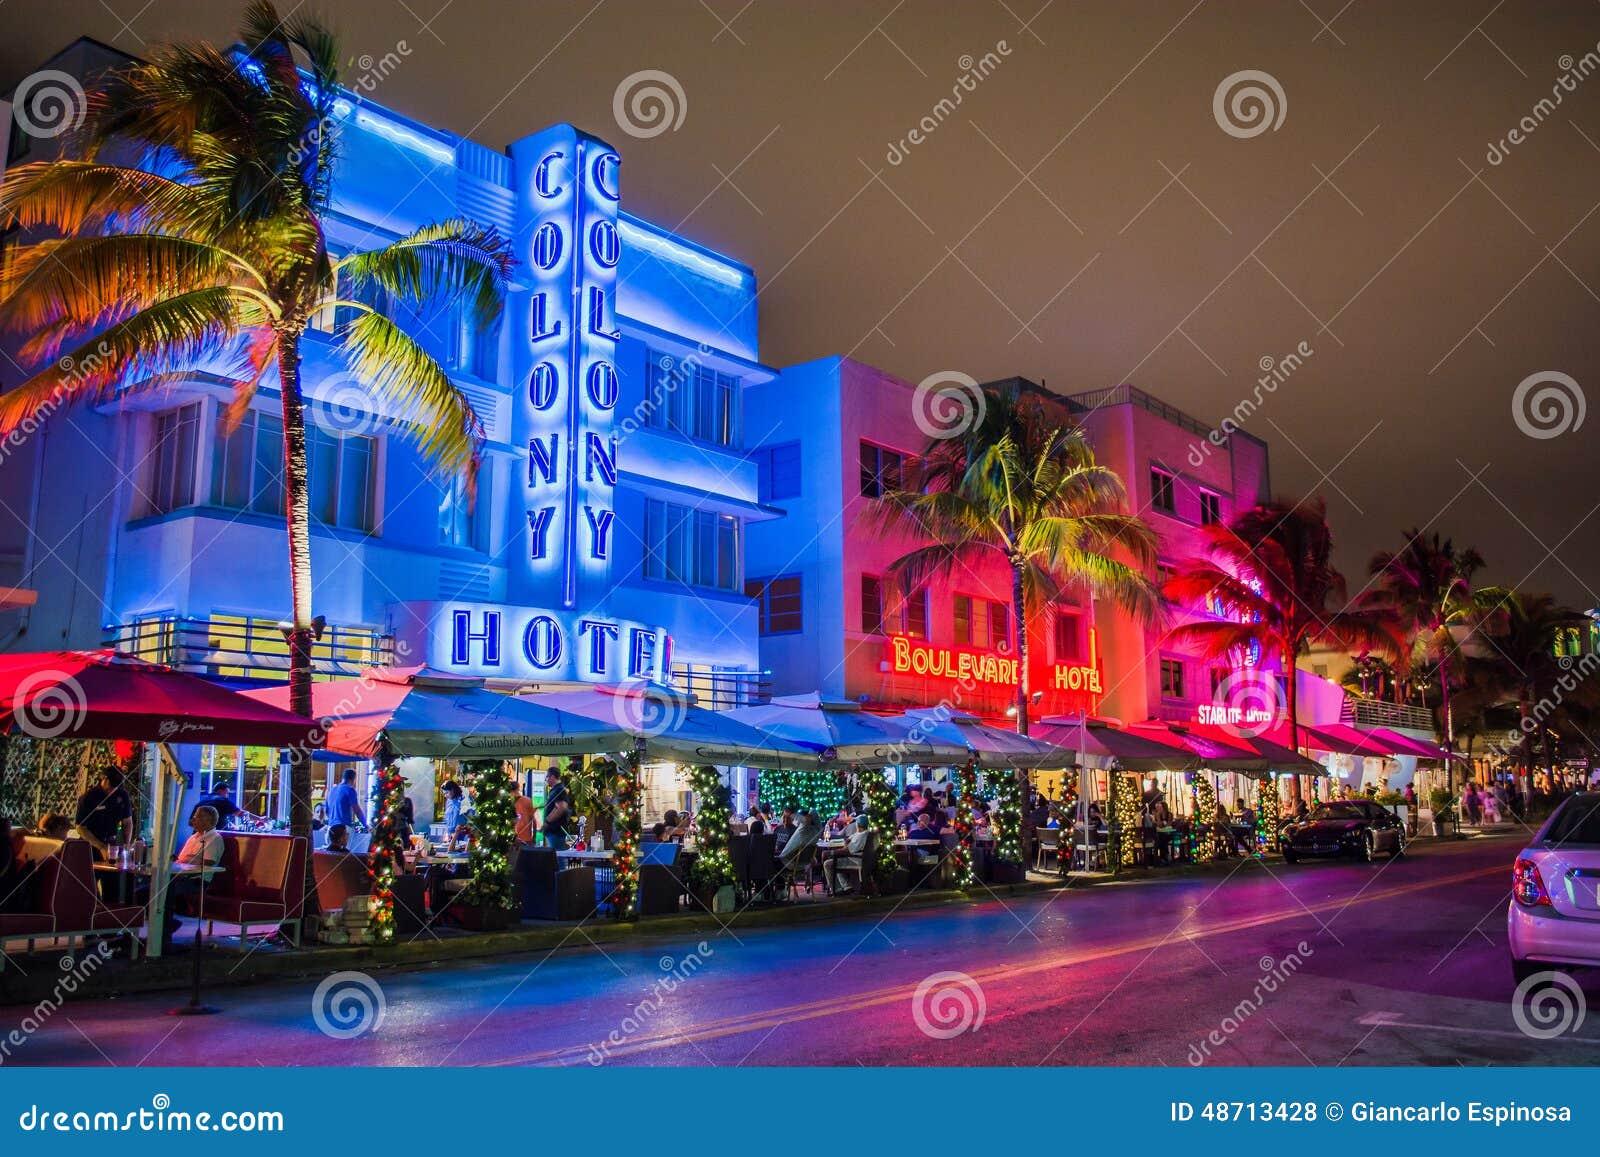 miami beach hotels editorial stock photo image of miami. Black Bedroom Furniture Sets. Home Design Ideas